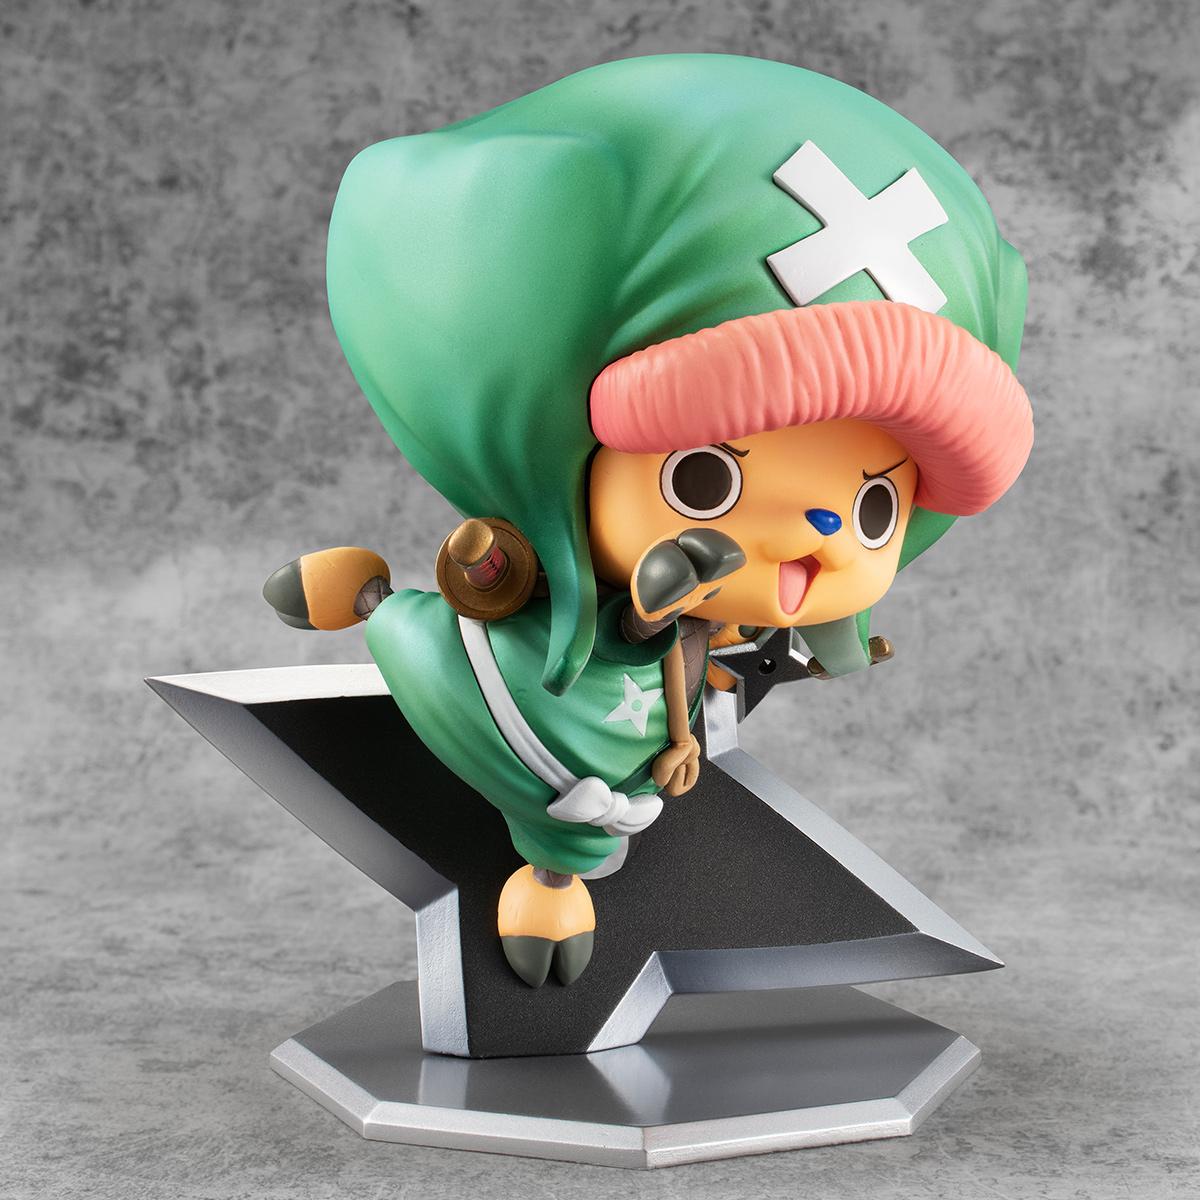 Chopperemon Warriors Alliance Ver Portrait of Pirates One Piece Figure